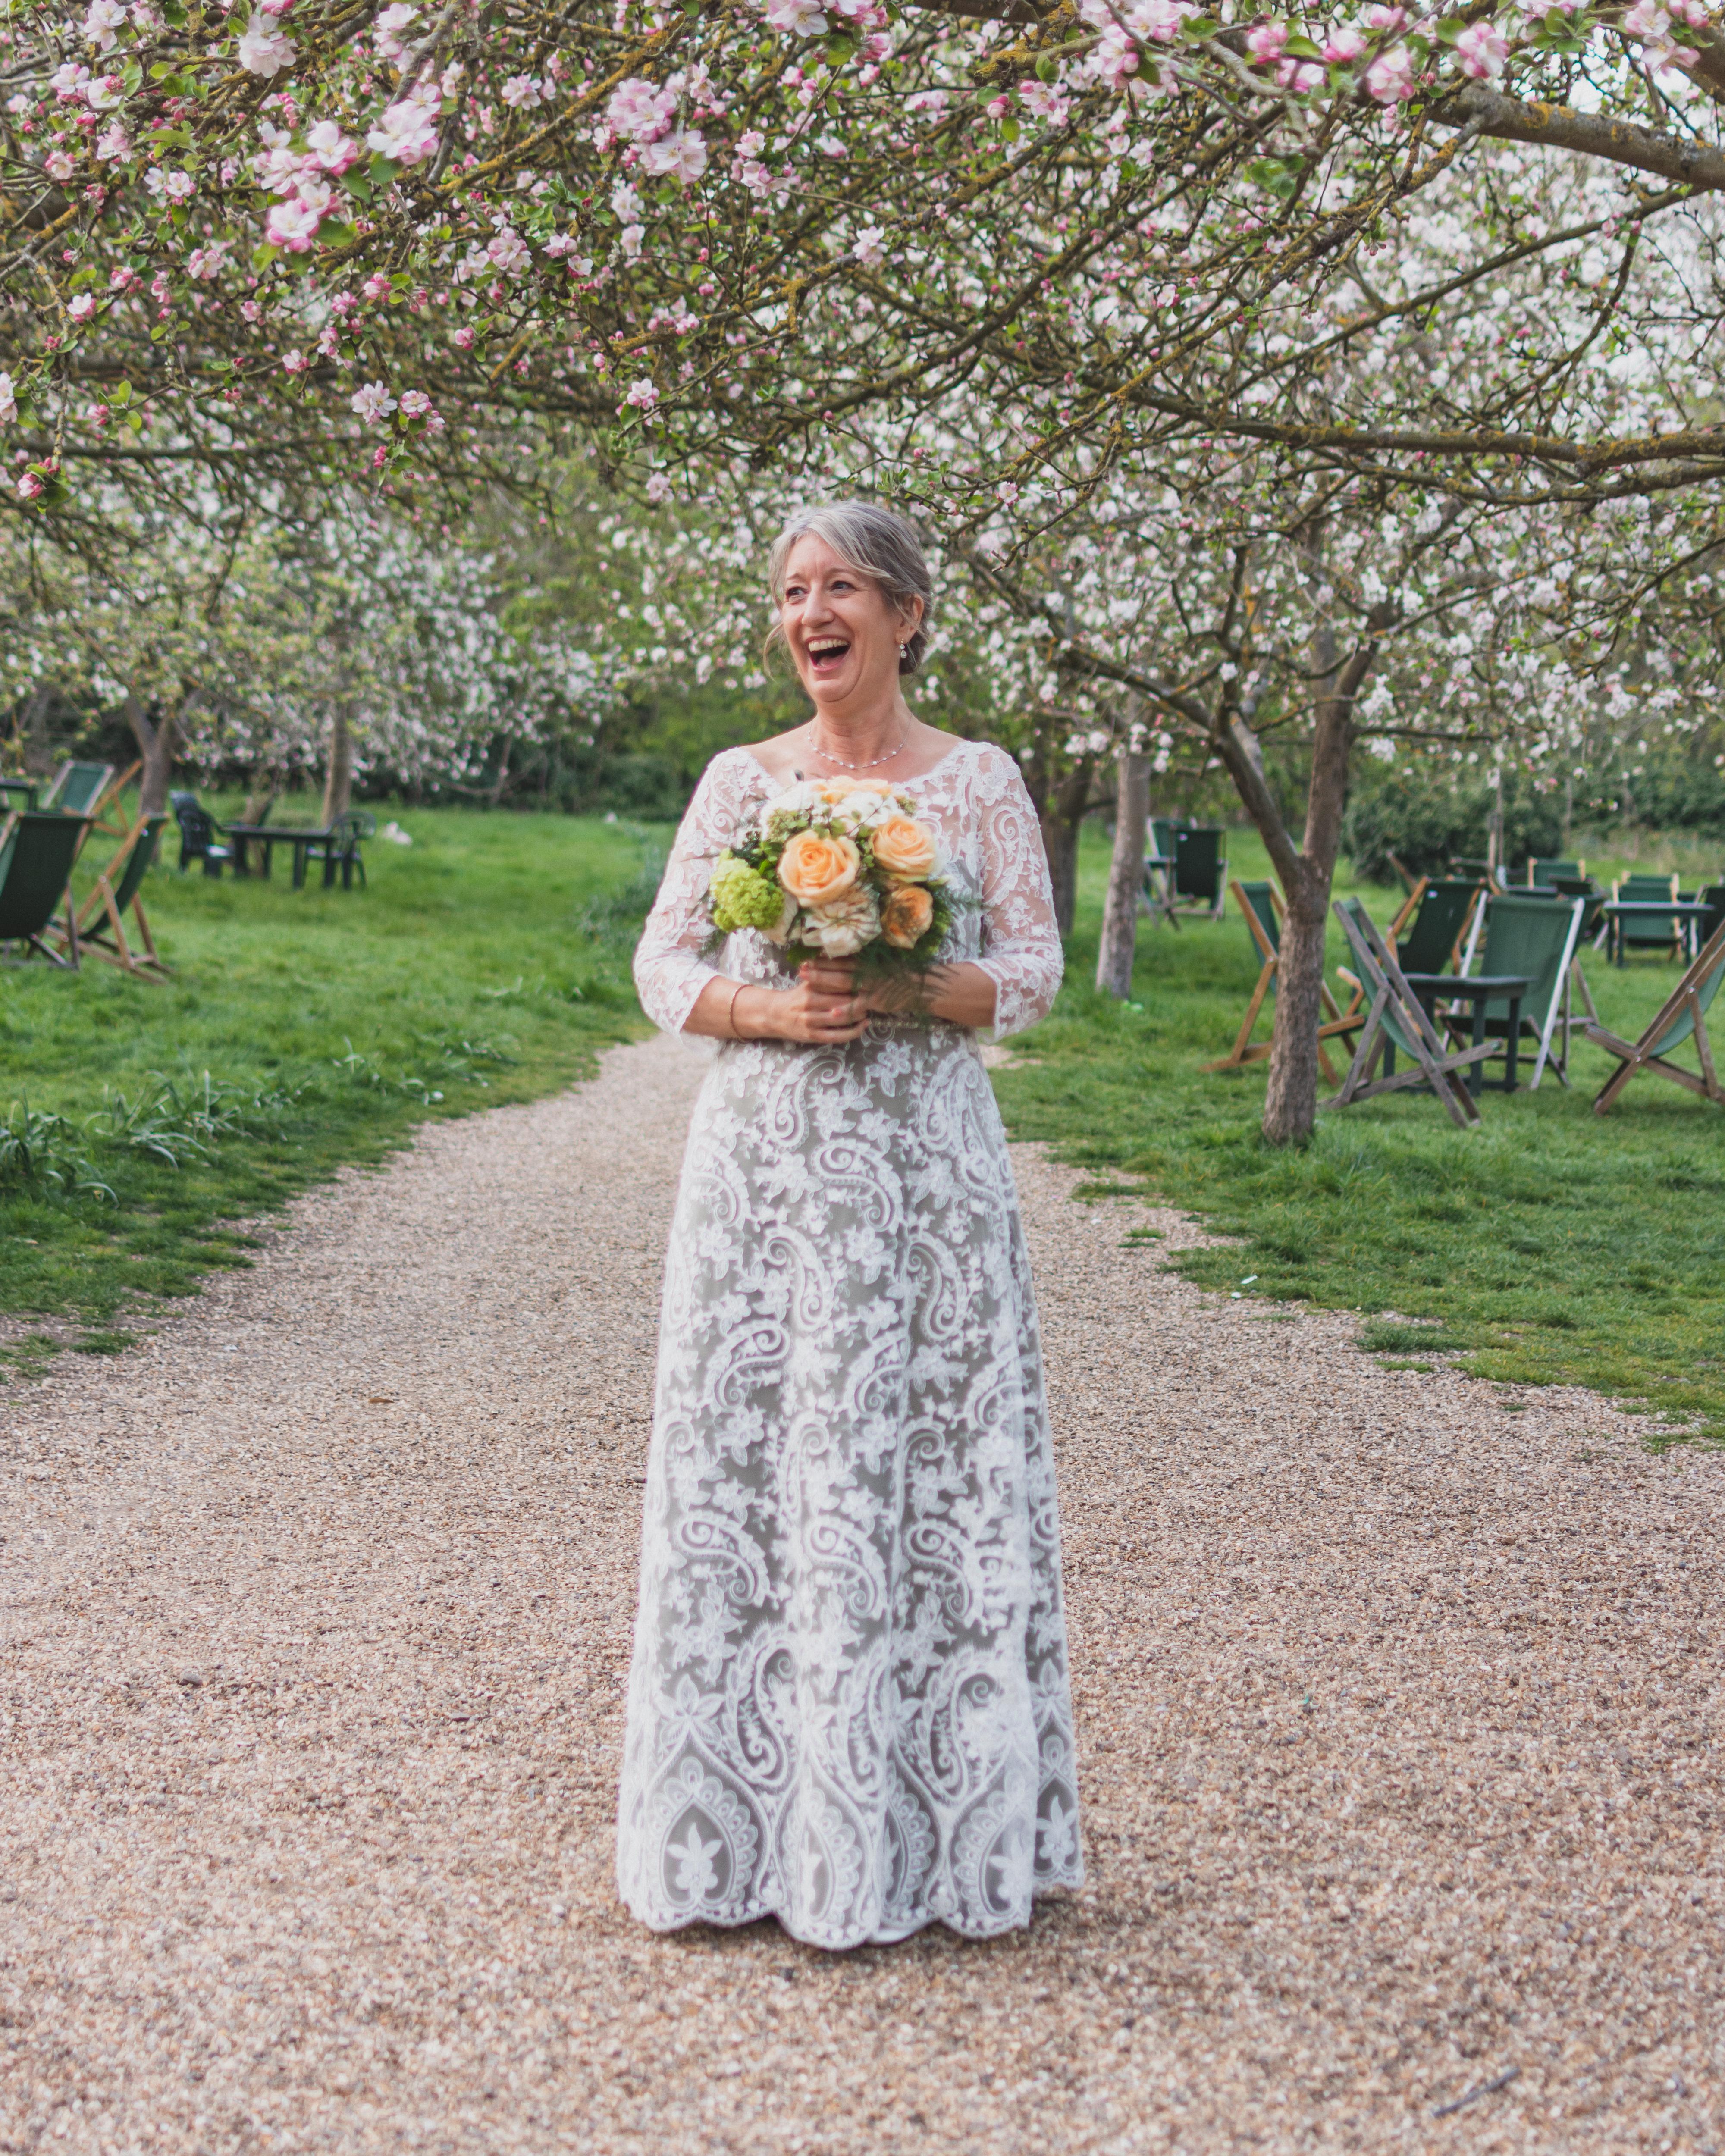 Bride on wedding day in lace wedding dress